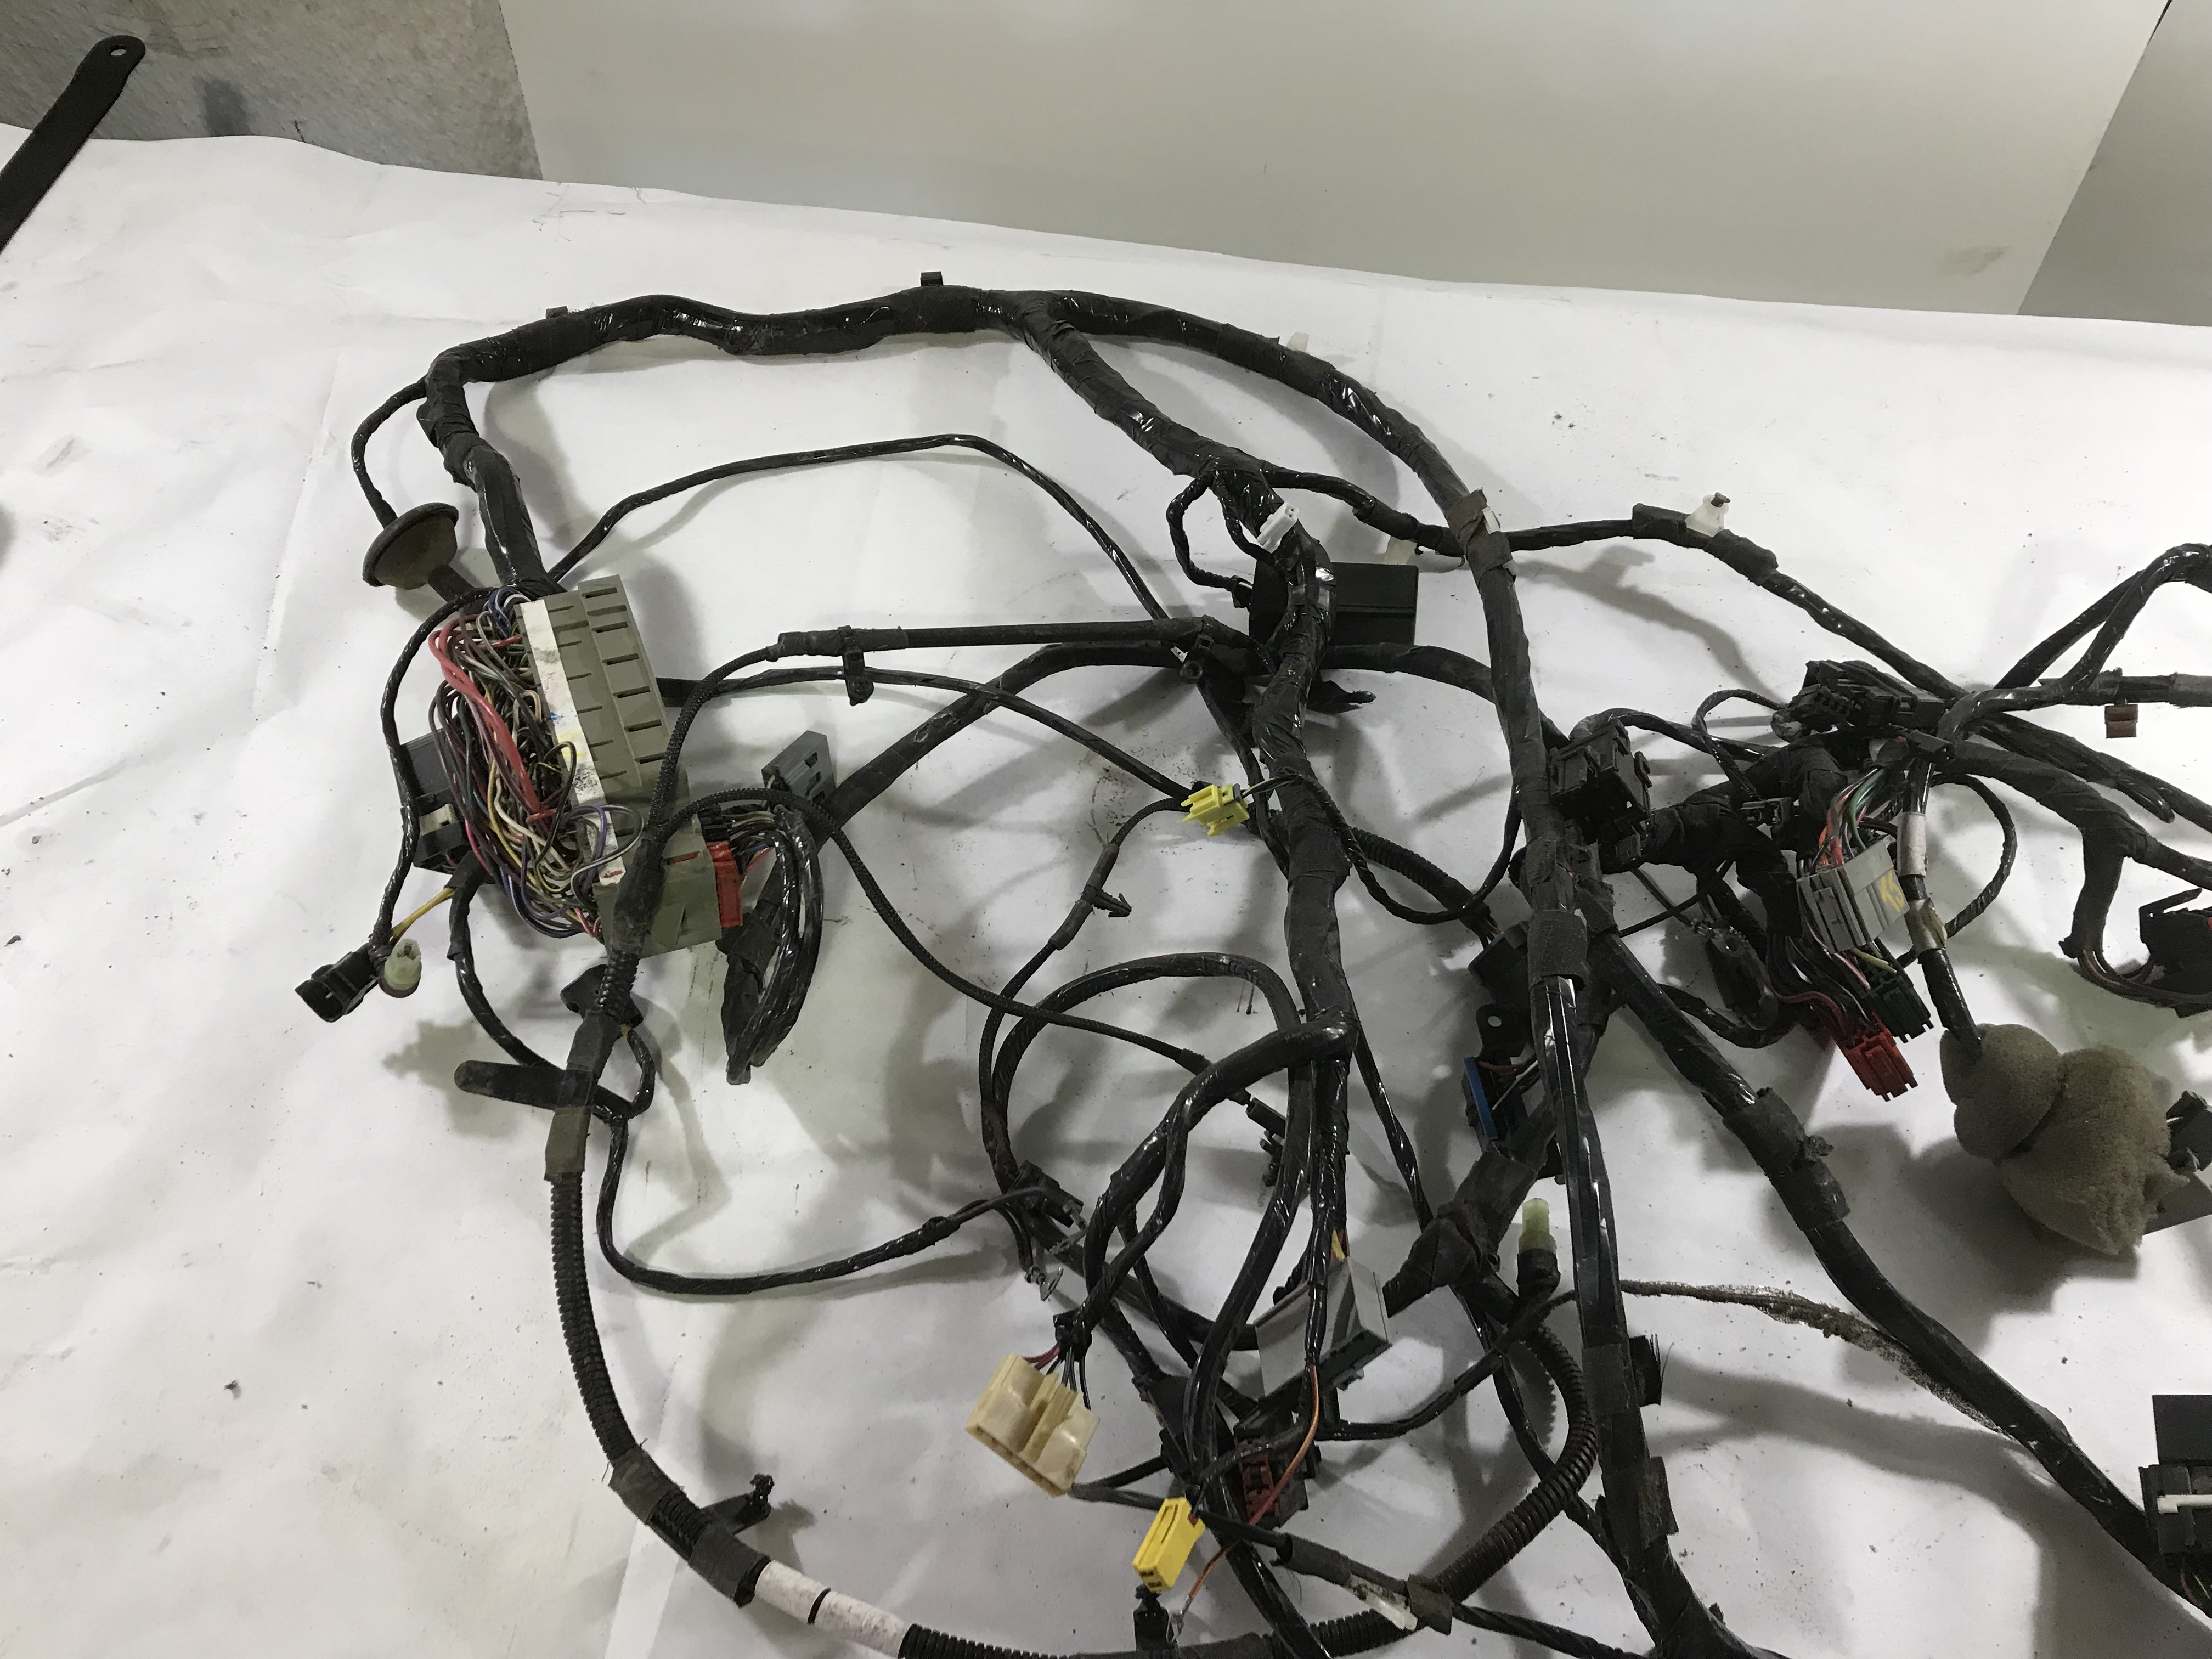 1990 jeep wrangler wiring harness diagram jeep yj dash wiring wiring diagram data  jeep yj dash wiring wiring diagram data